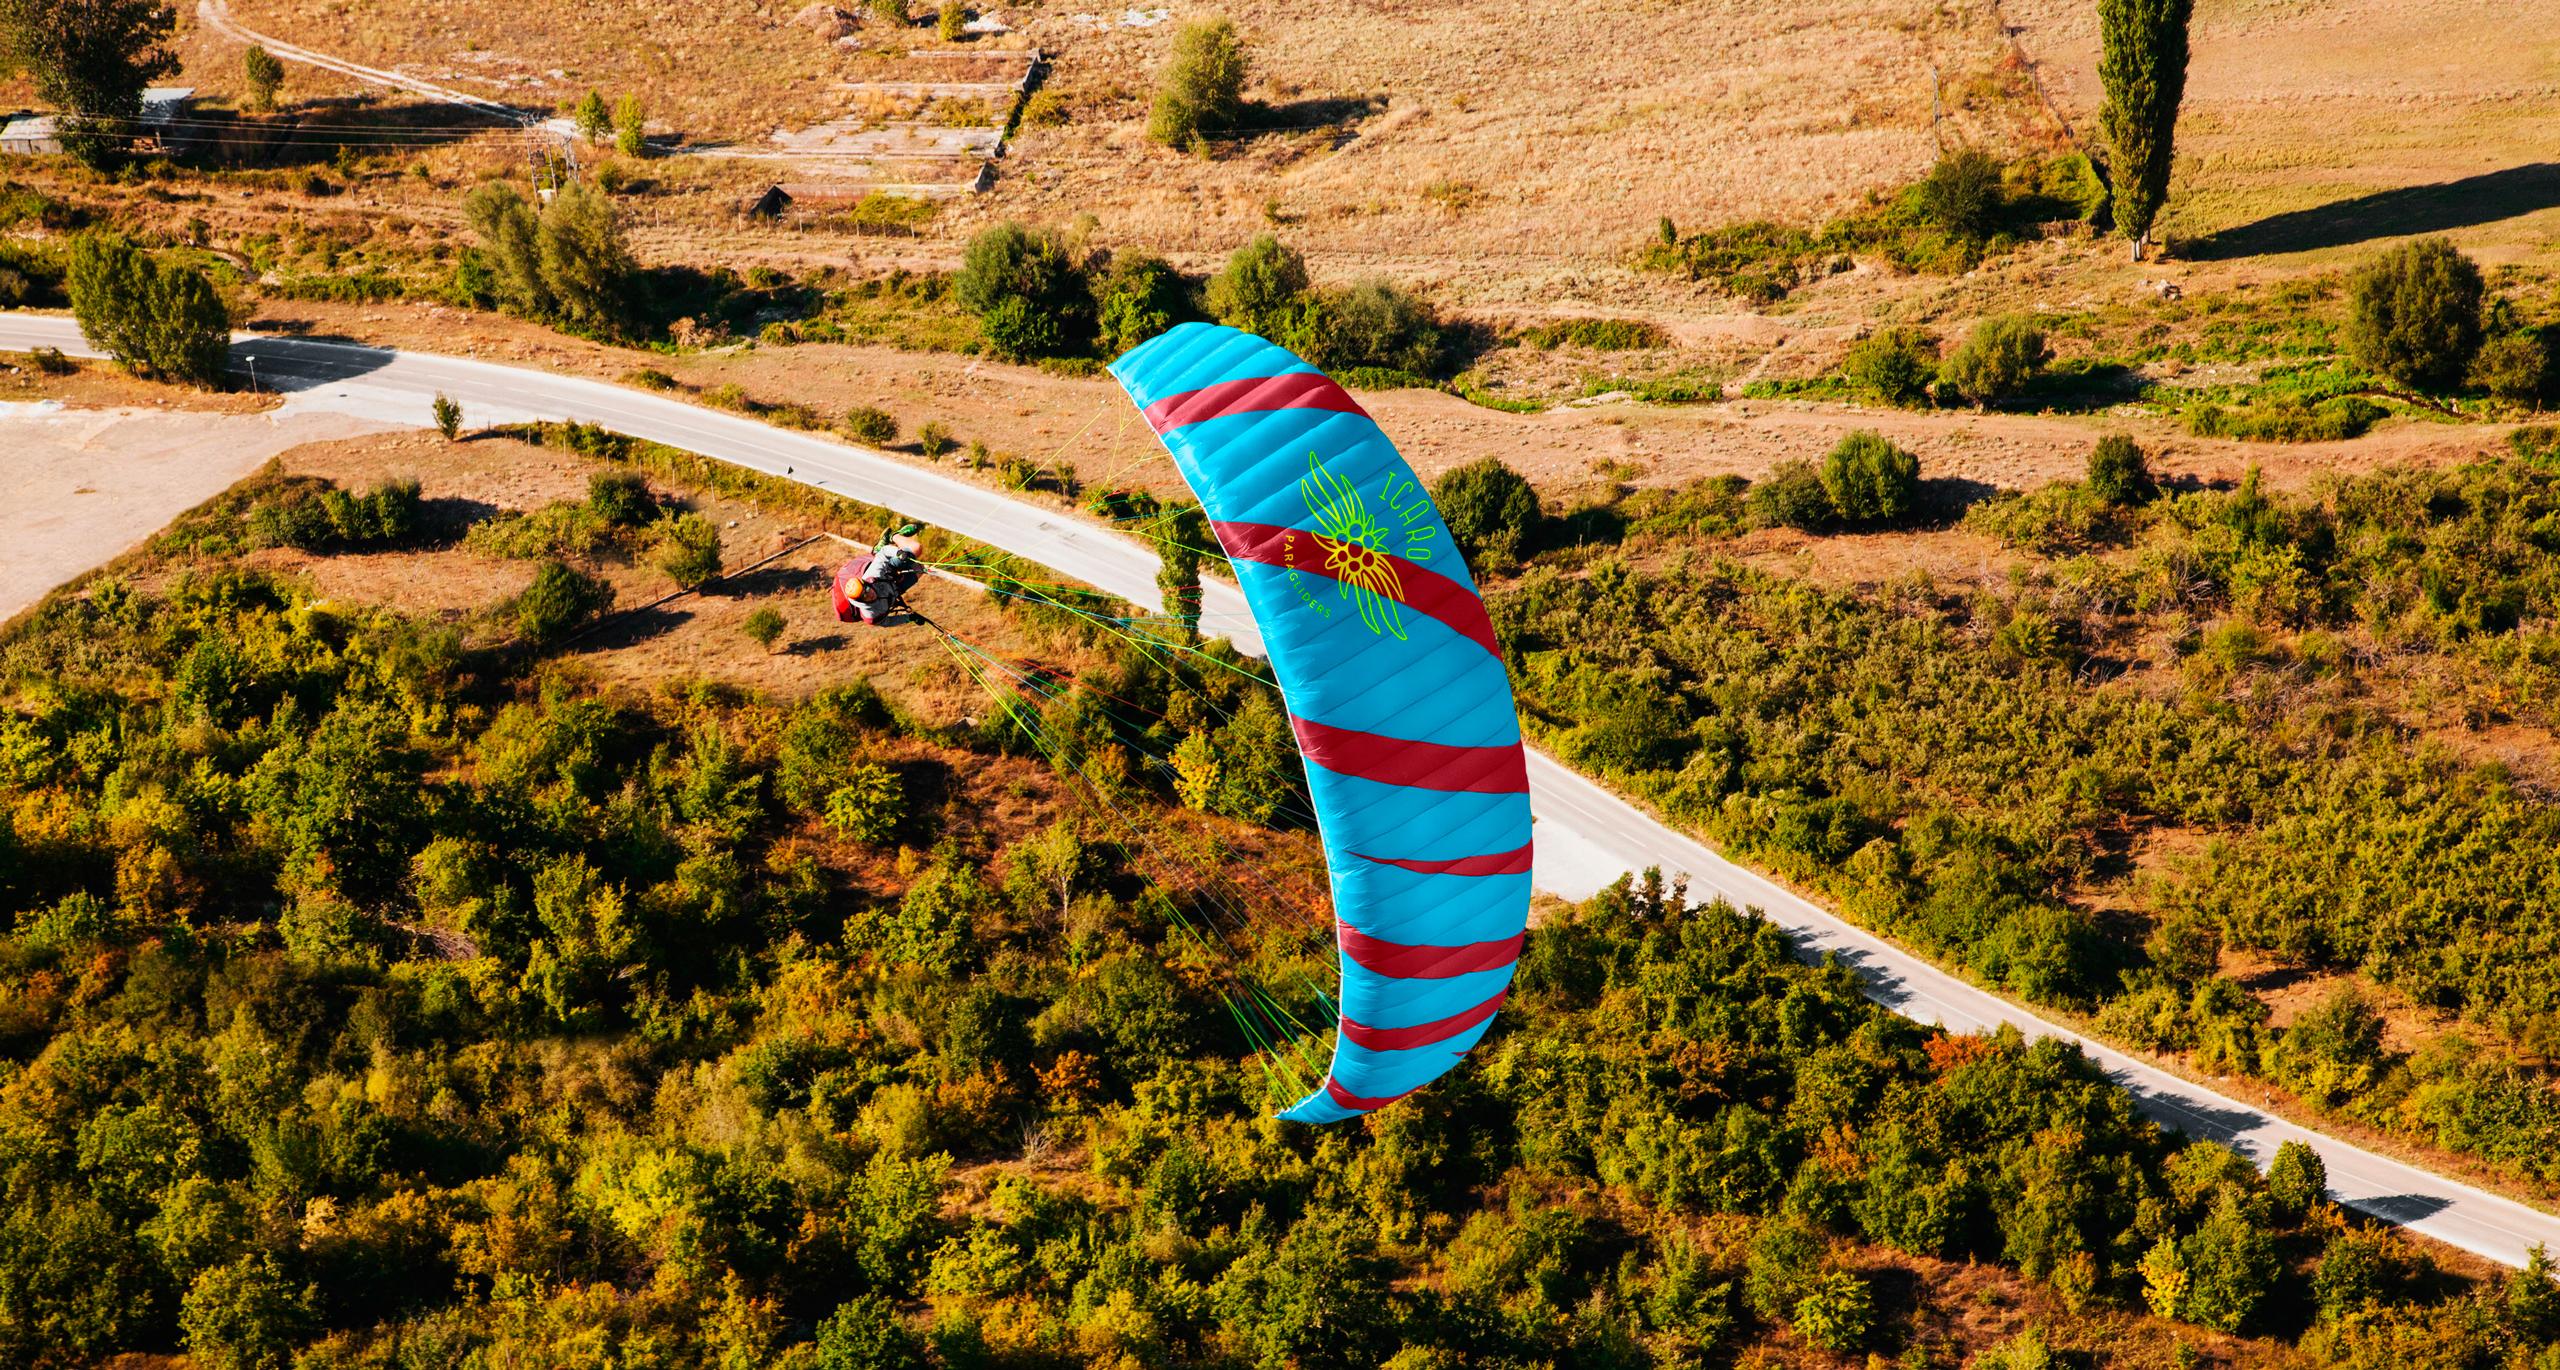 Icaro Paragliders Make An Impression